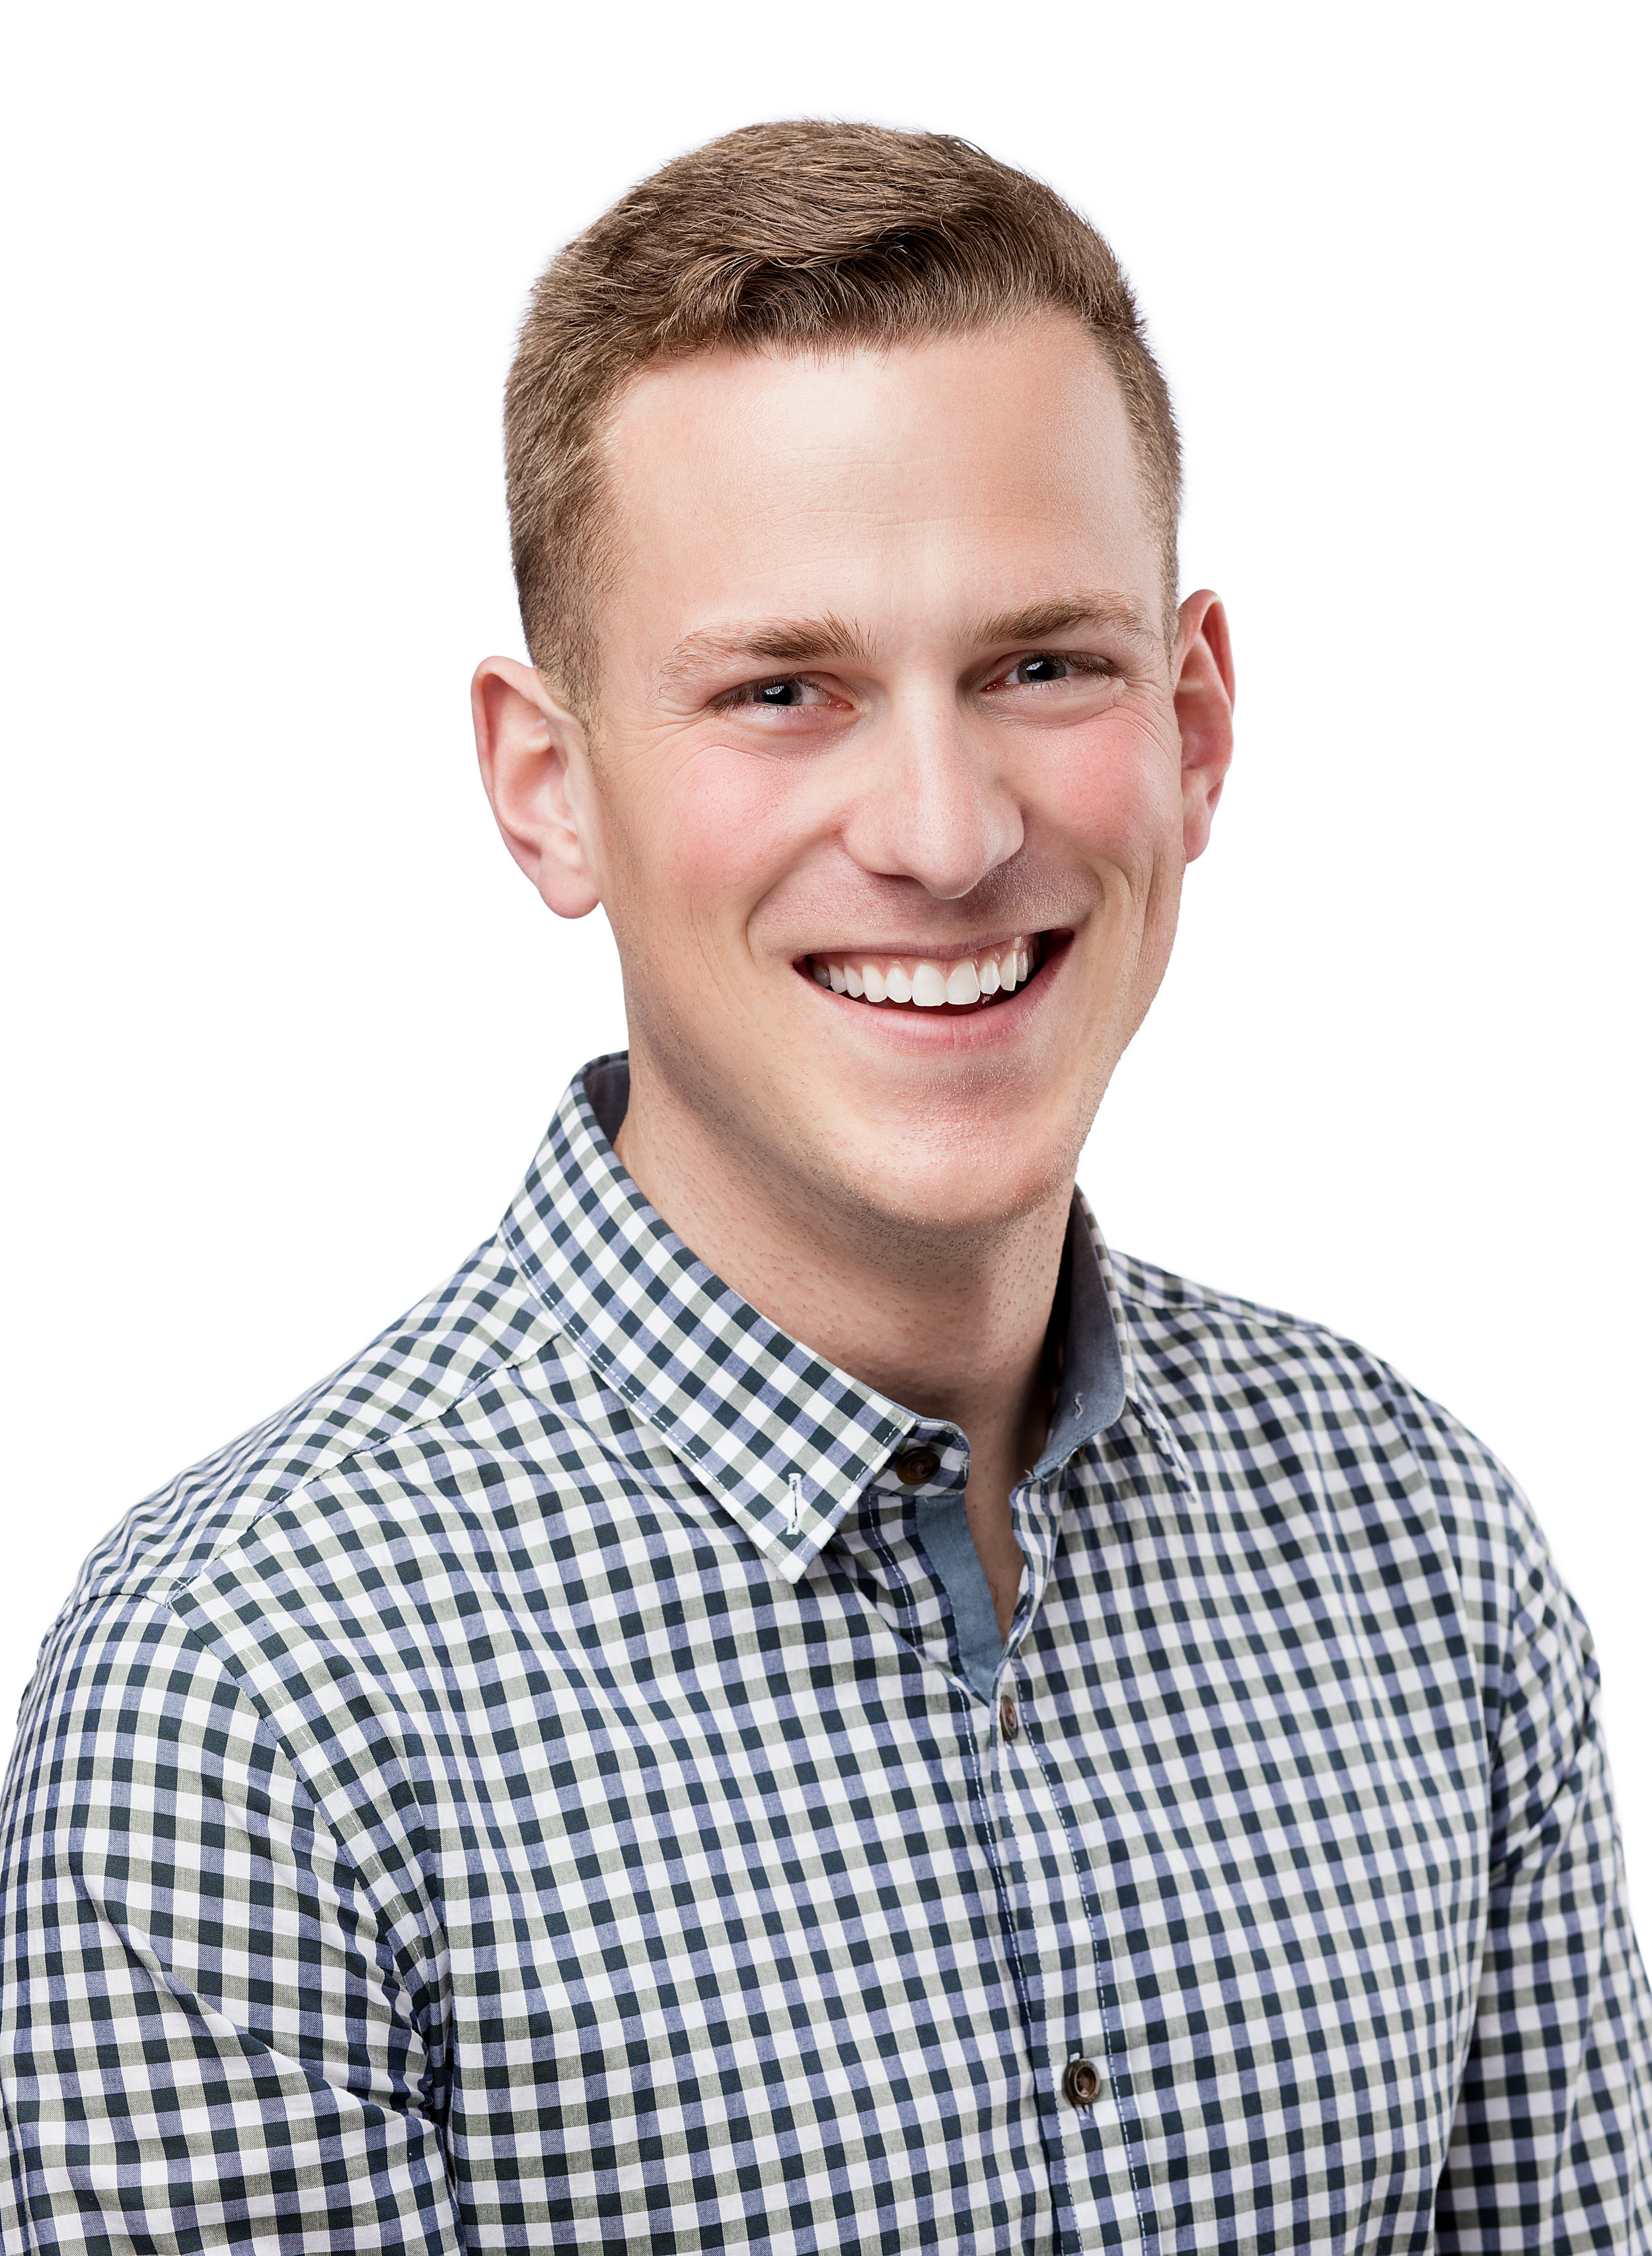 Male Everett marysville headshot on white background studio business linkedin